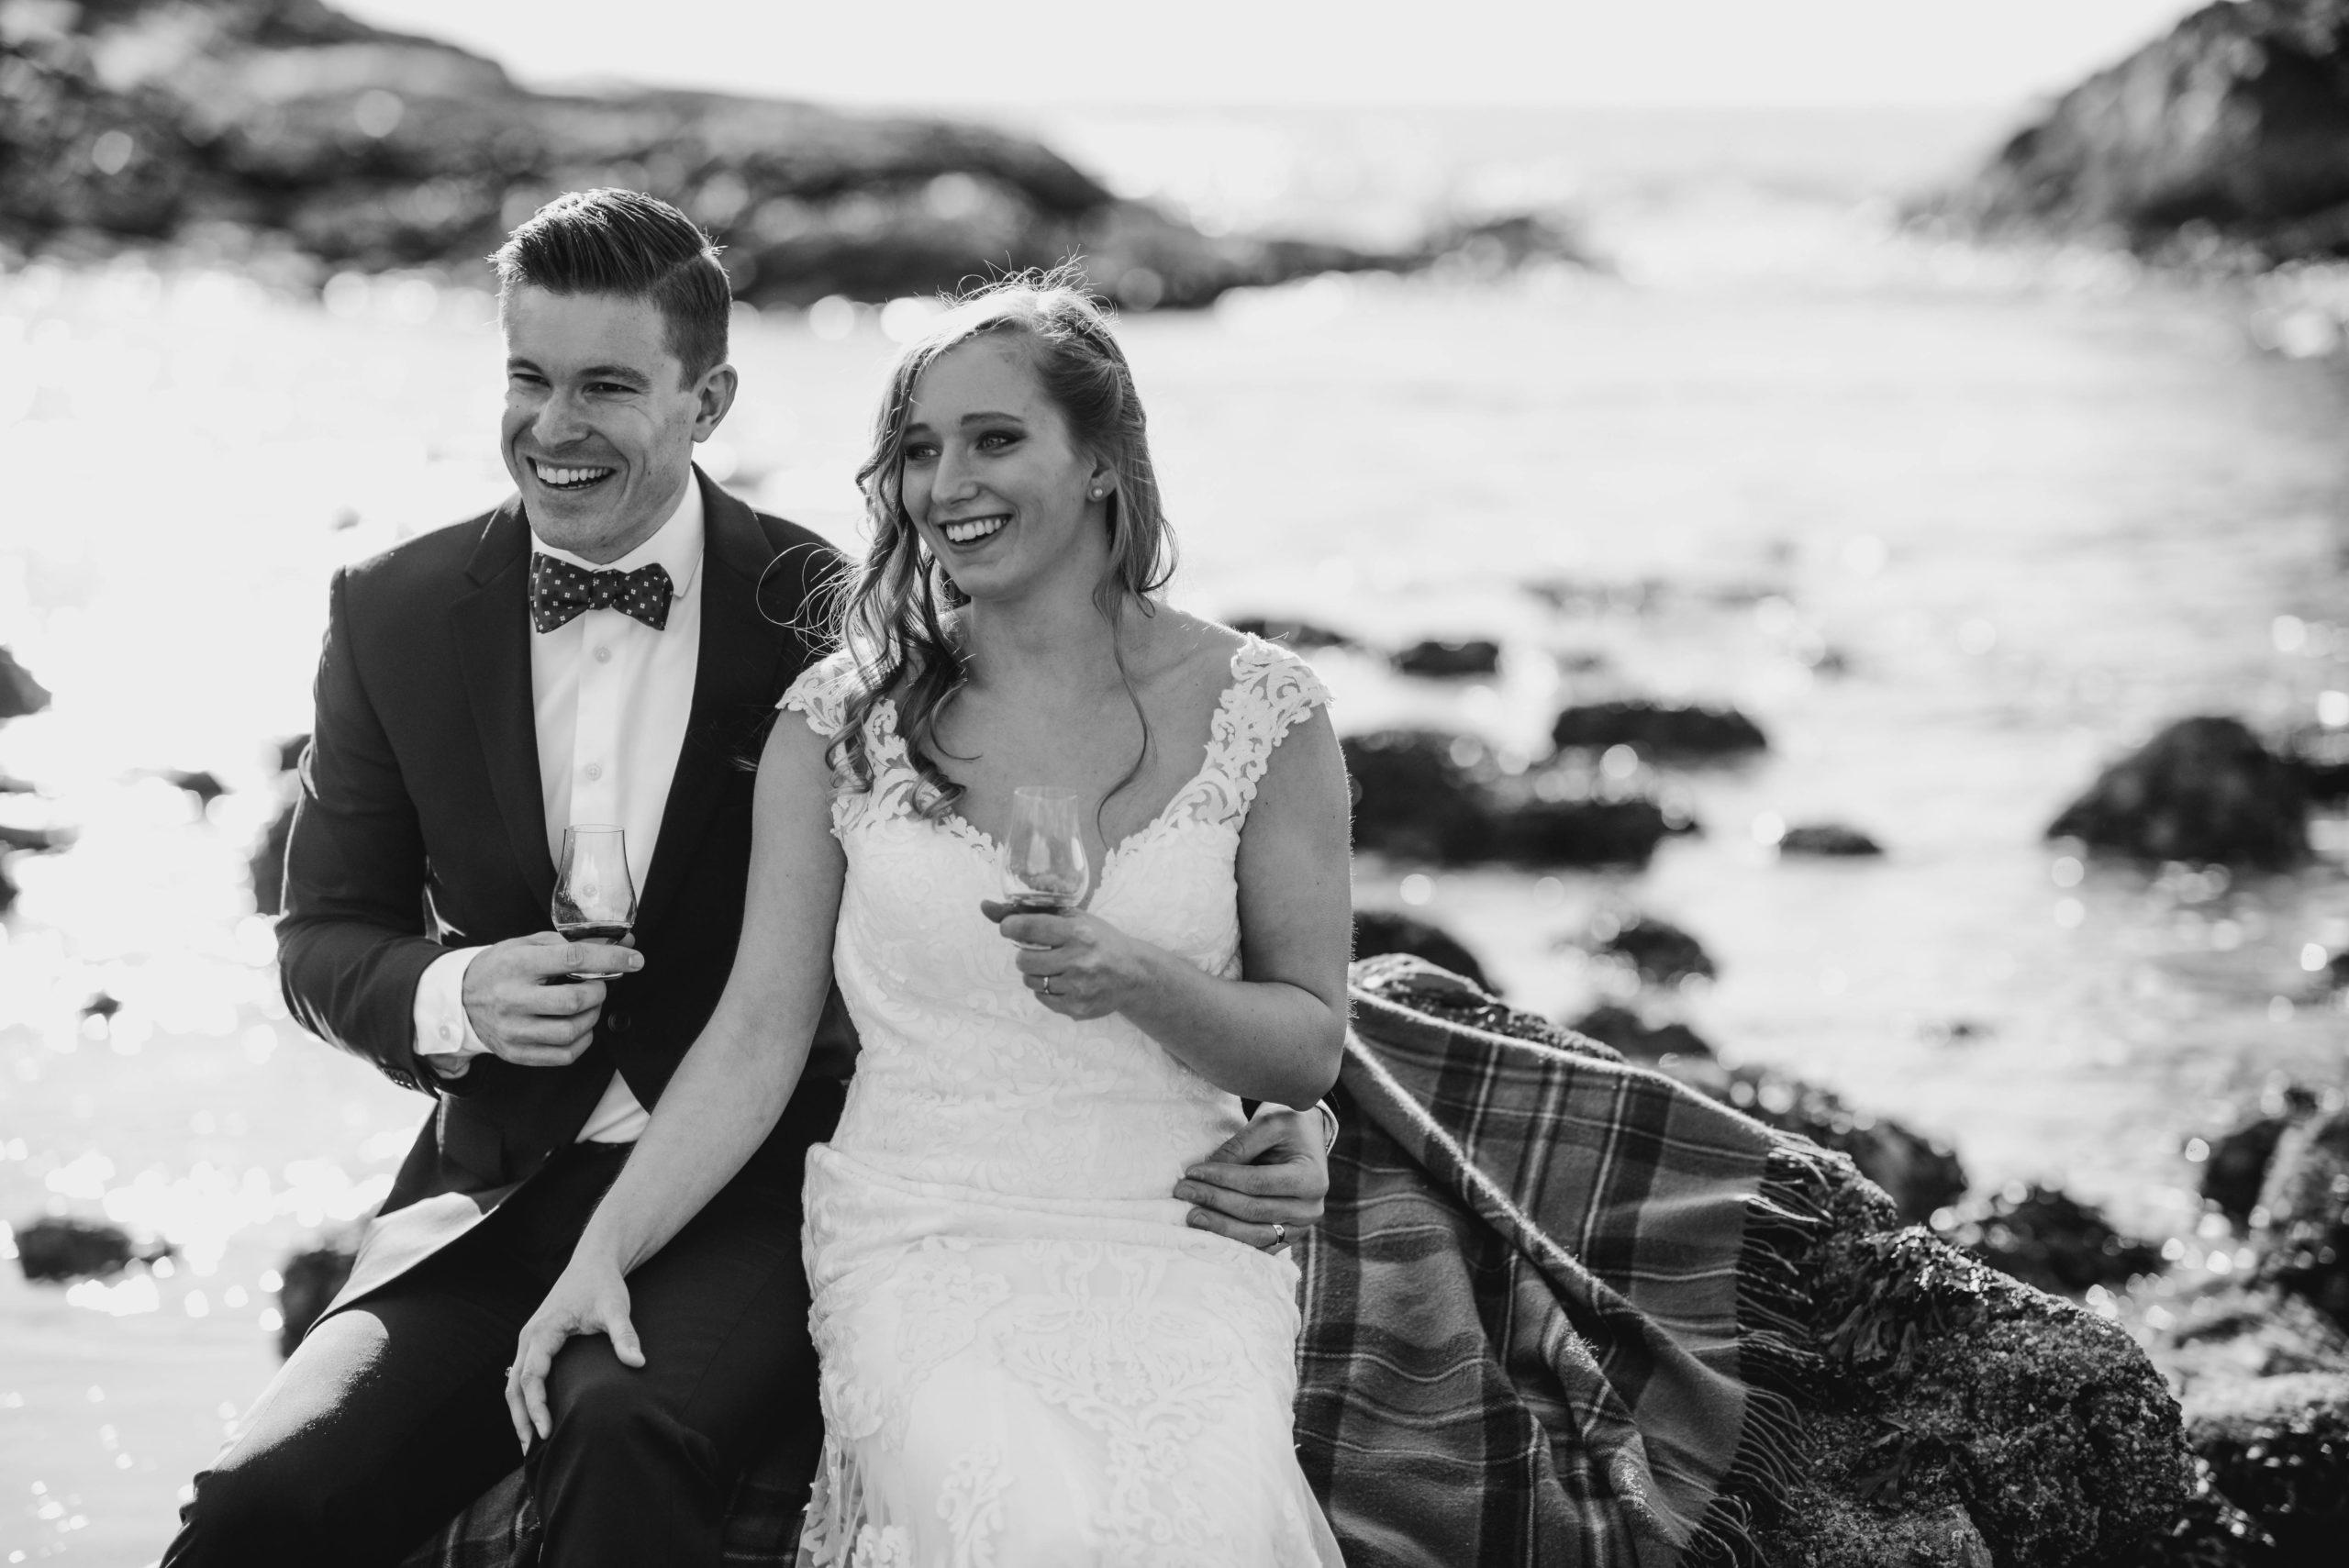 Karley Bracey Wedding Photography